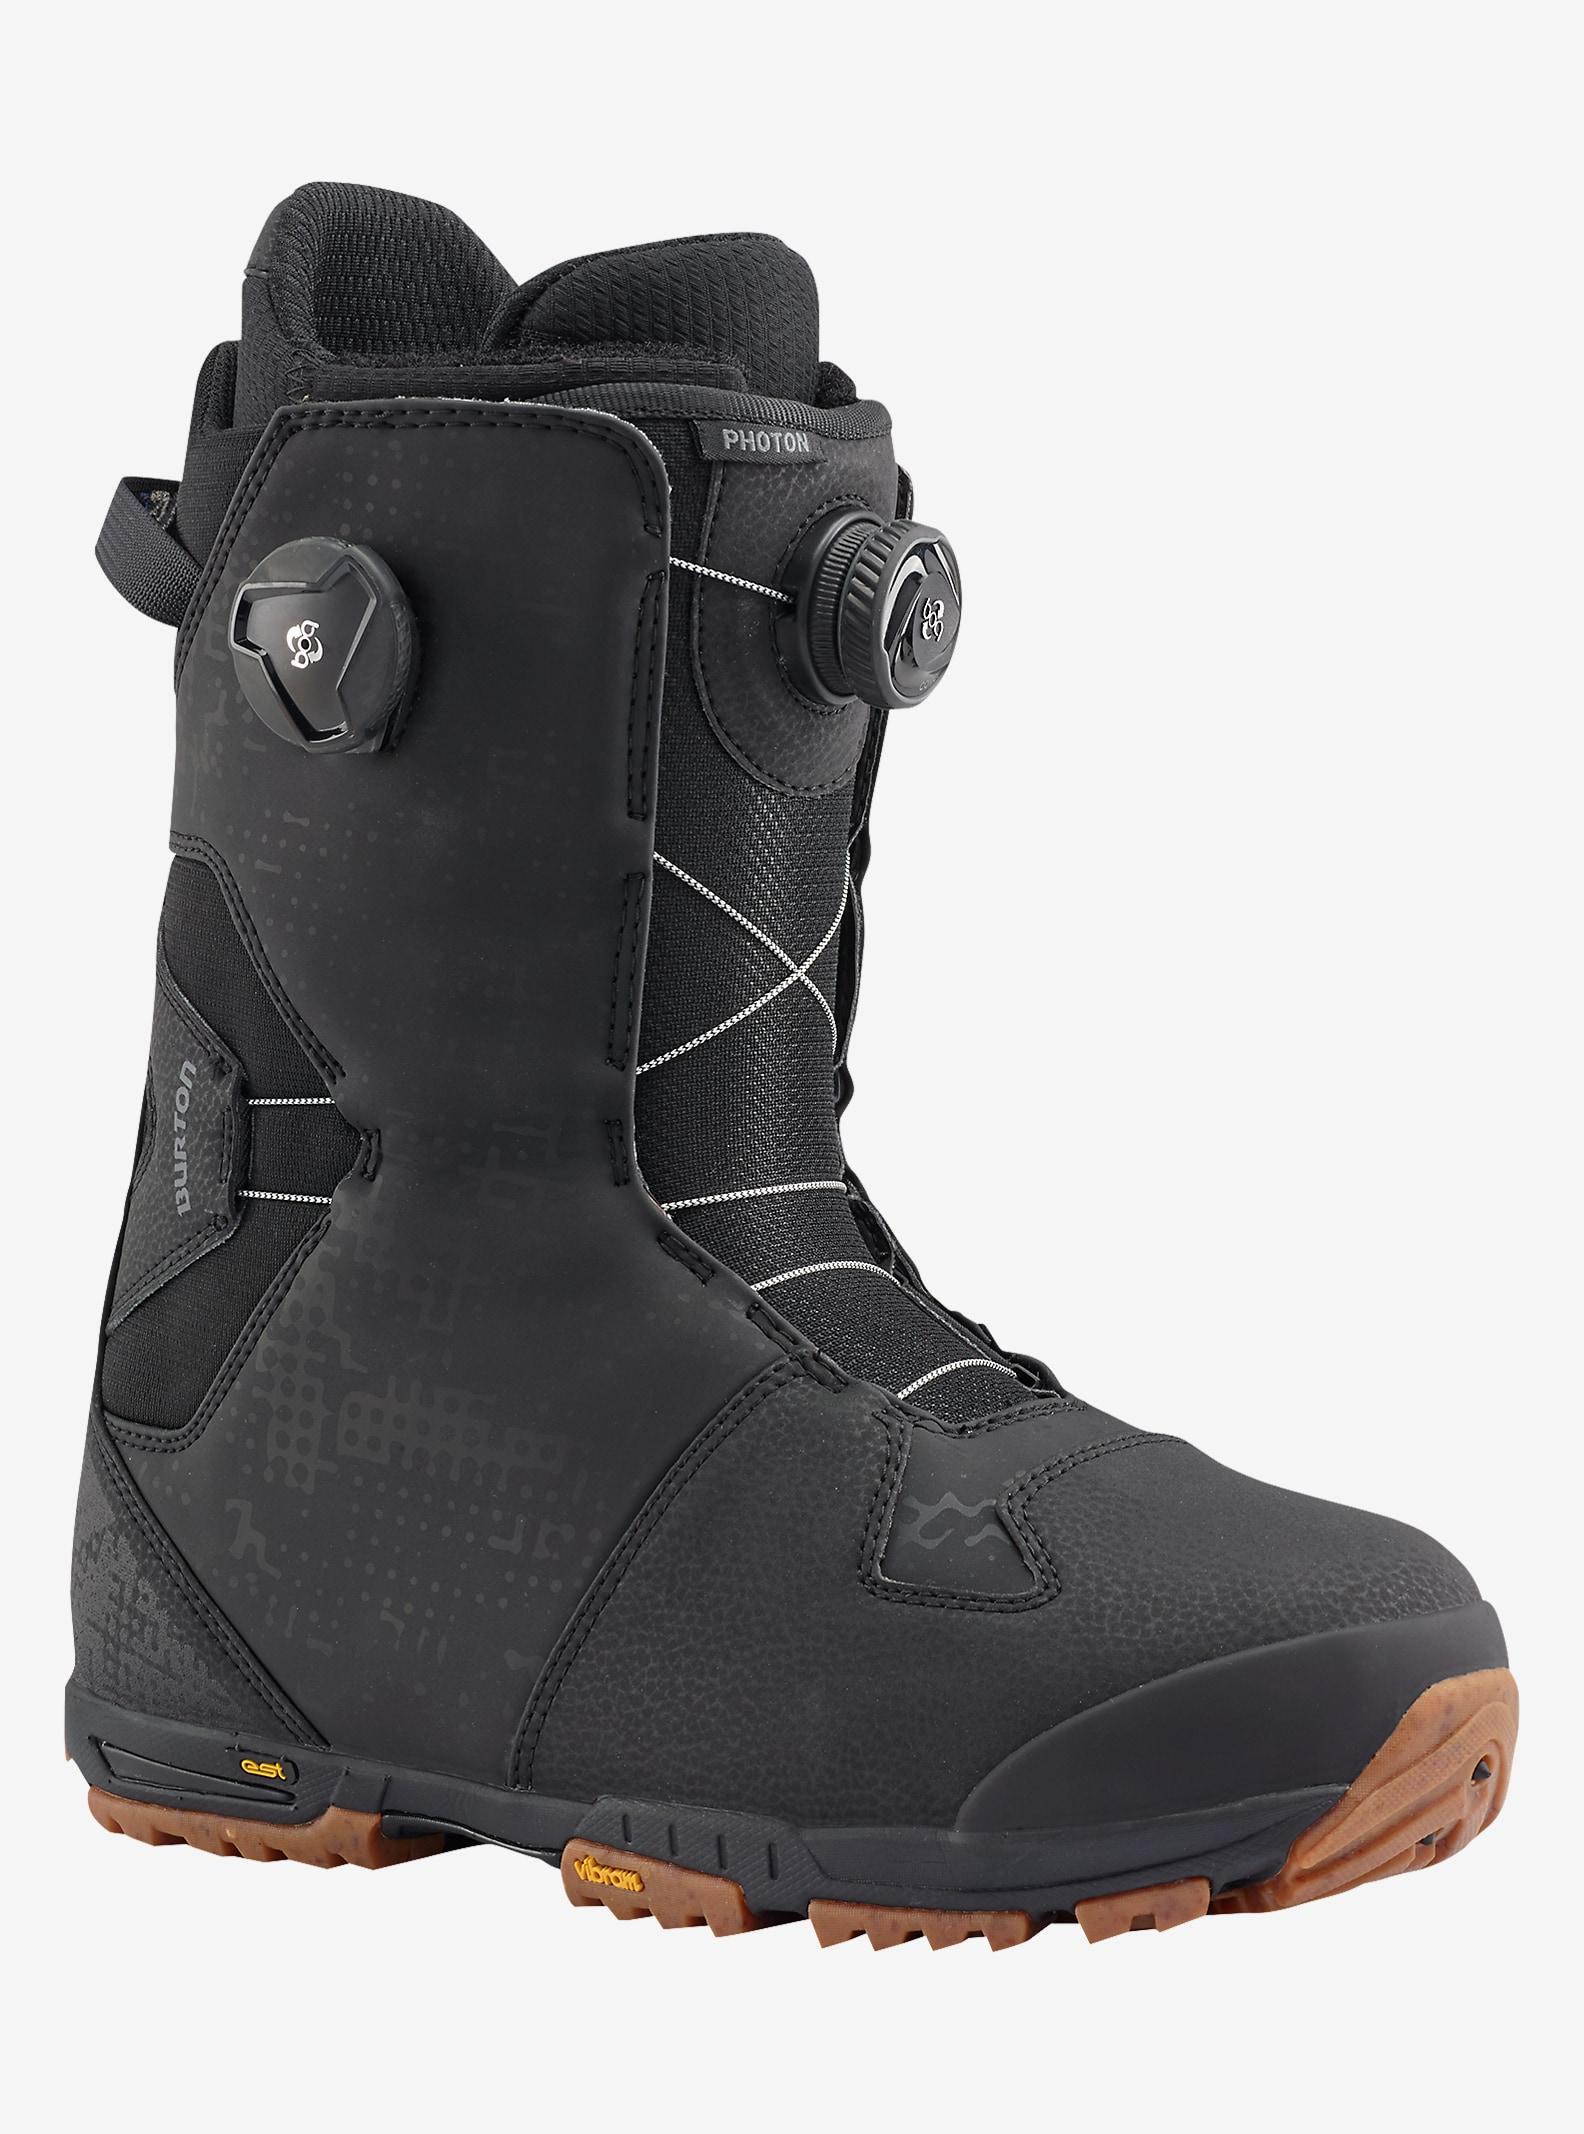 Burton Photon Boa® Snowboard Boot shown in Black / Gum